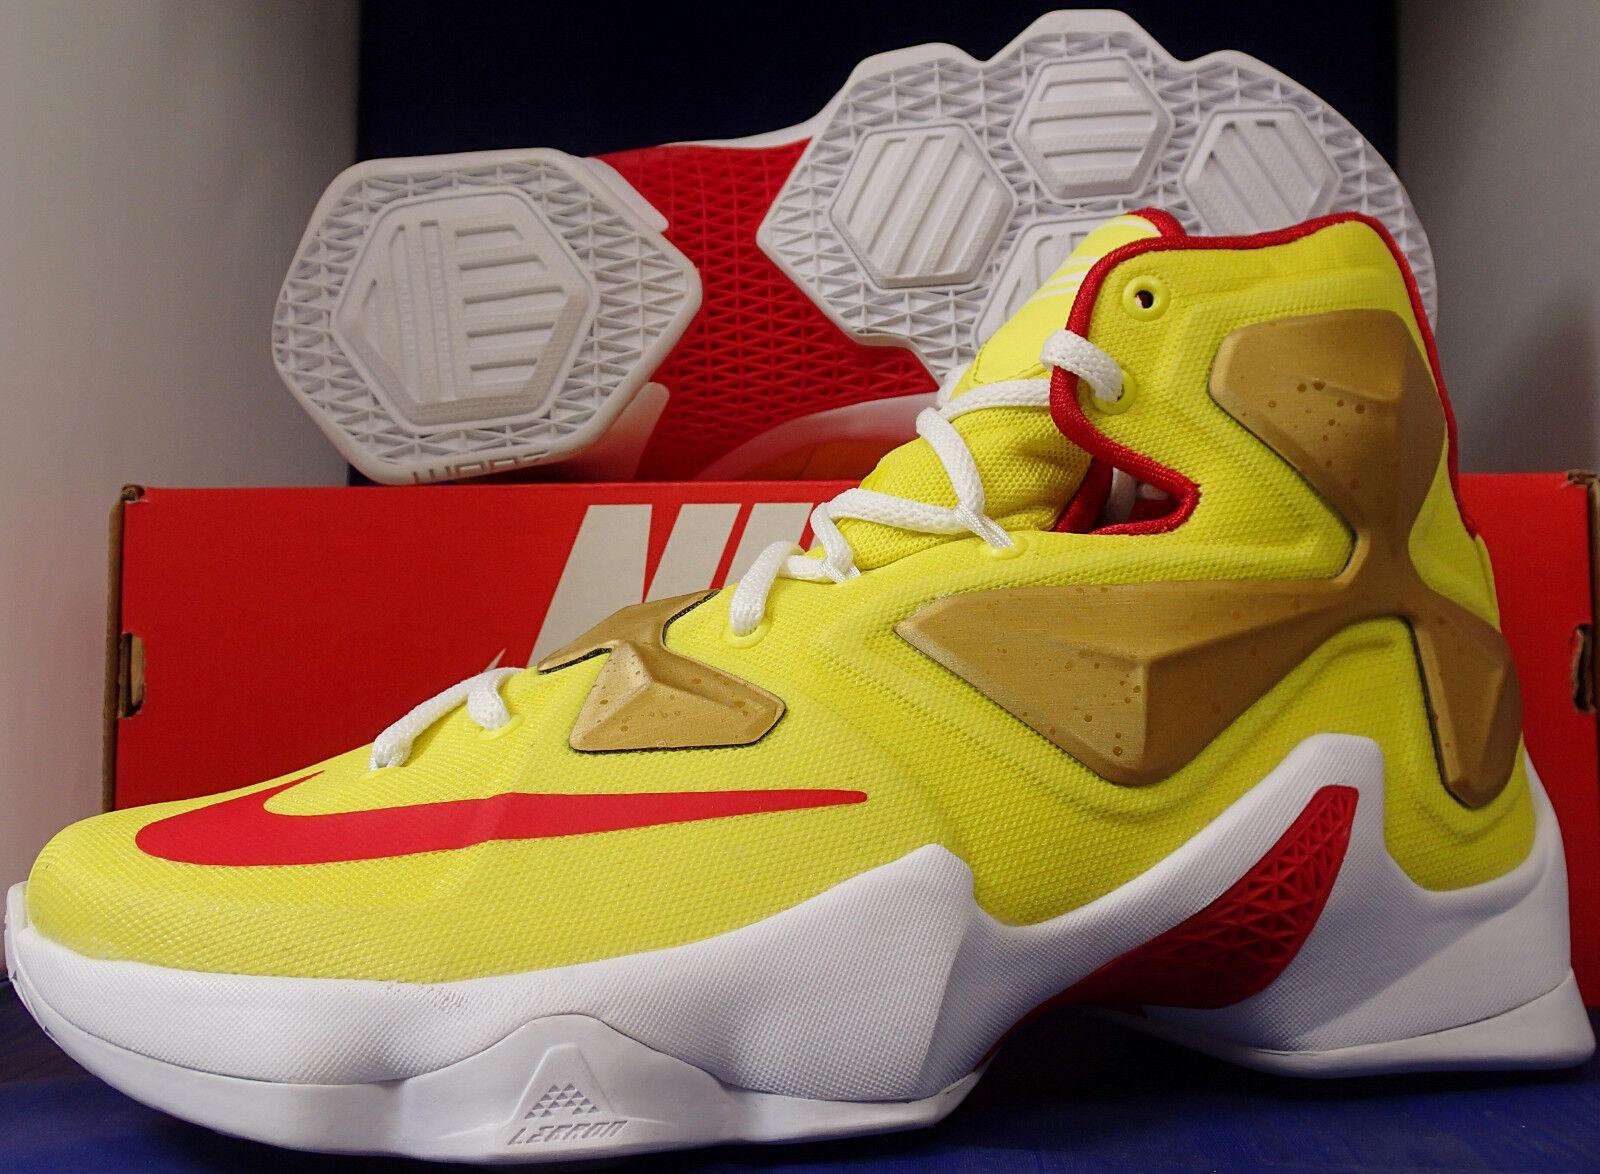 Nike Lebron XIII 13 iD University Gold Red SZ US 8.5 7 / Womens SZ 8.5 US (836141-992) 6d7ced